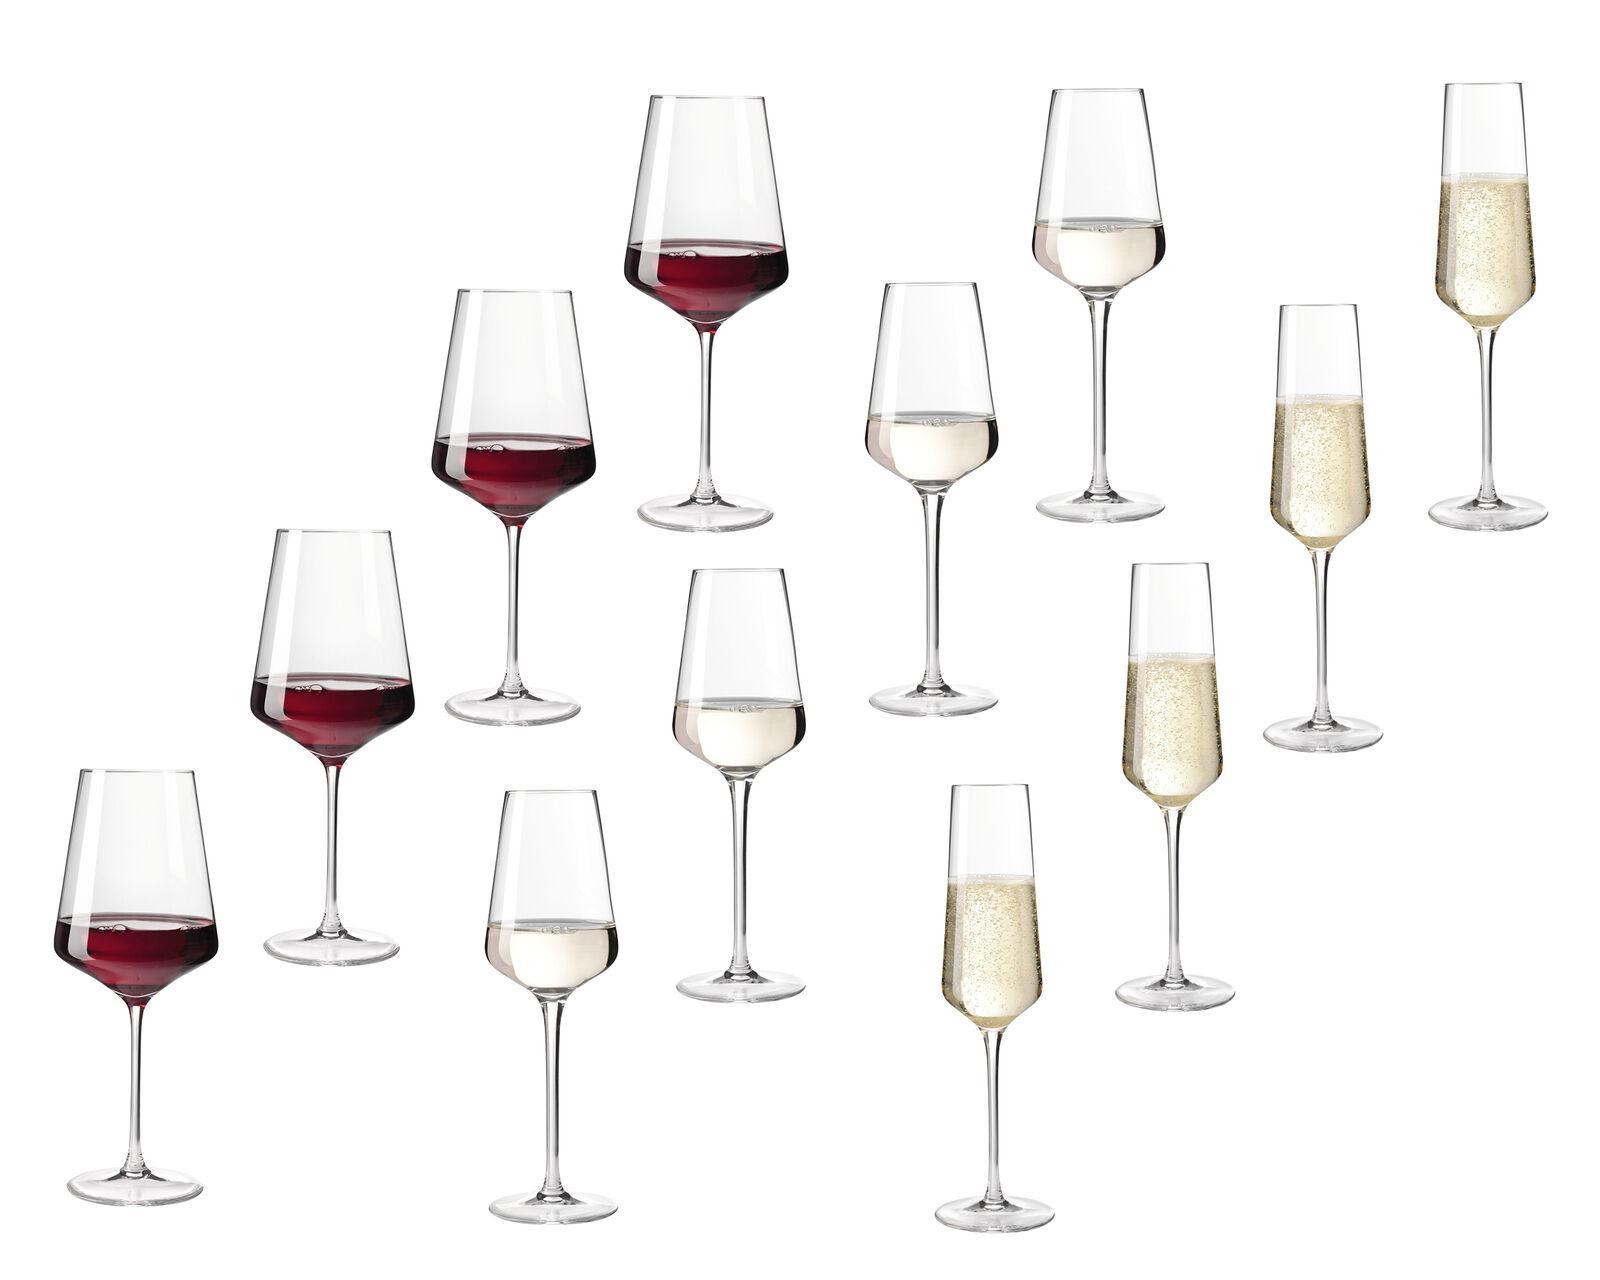 Leonardo Puccini, 12-teiliges Kelchglas-Set (4x Sektglas, 4x Weißweinglas, 4x Rotweinglas)